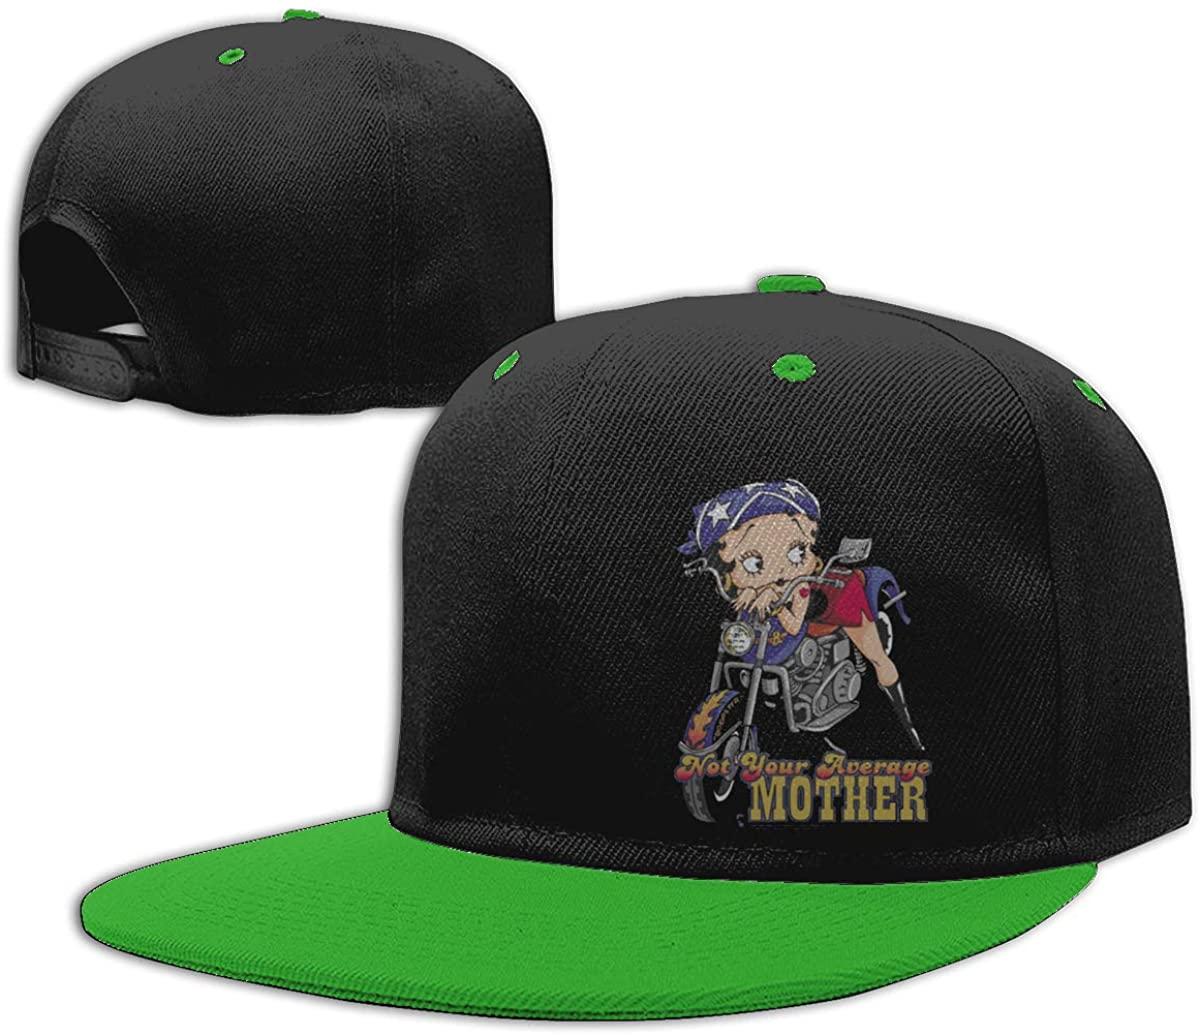 Boys Girls Sun Baseball Caps Cool Kids Children Flat Bill Hip Hop Hat Adjustable Snapback Hat